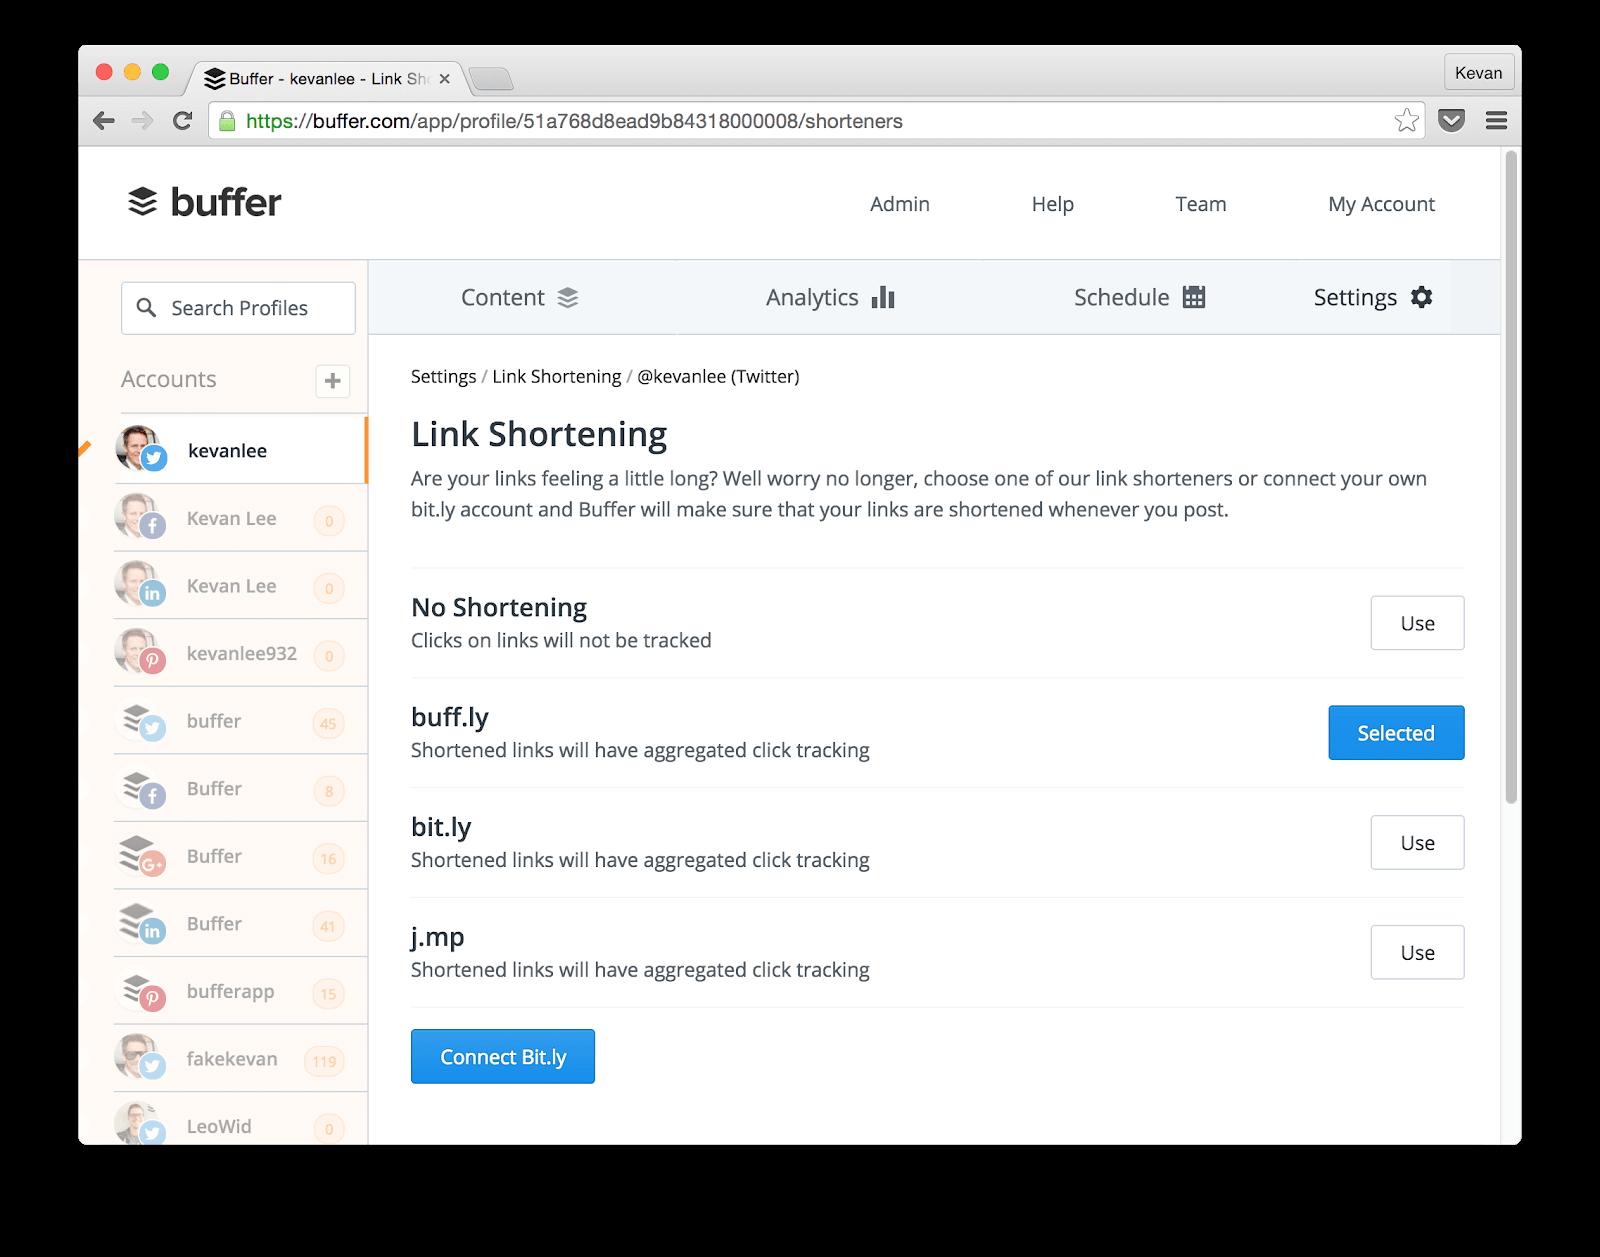 Buffer's link shortening page